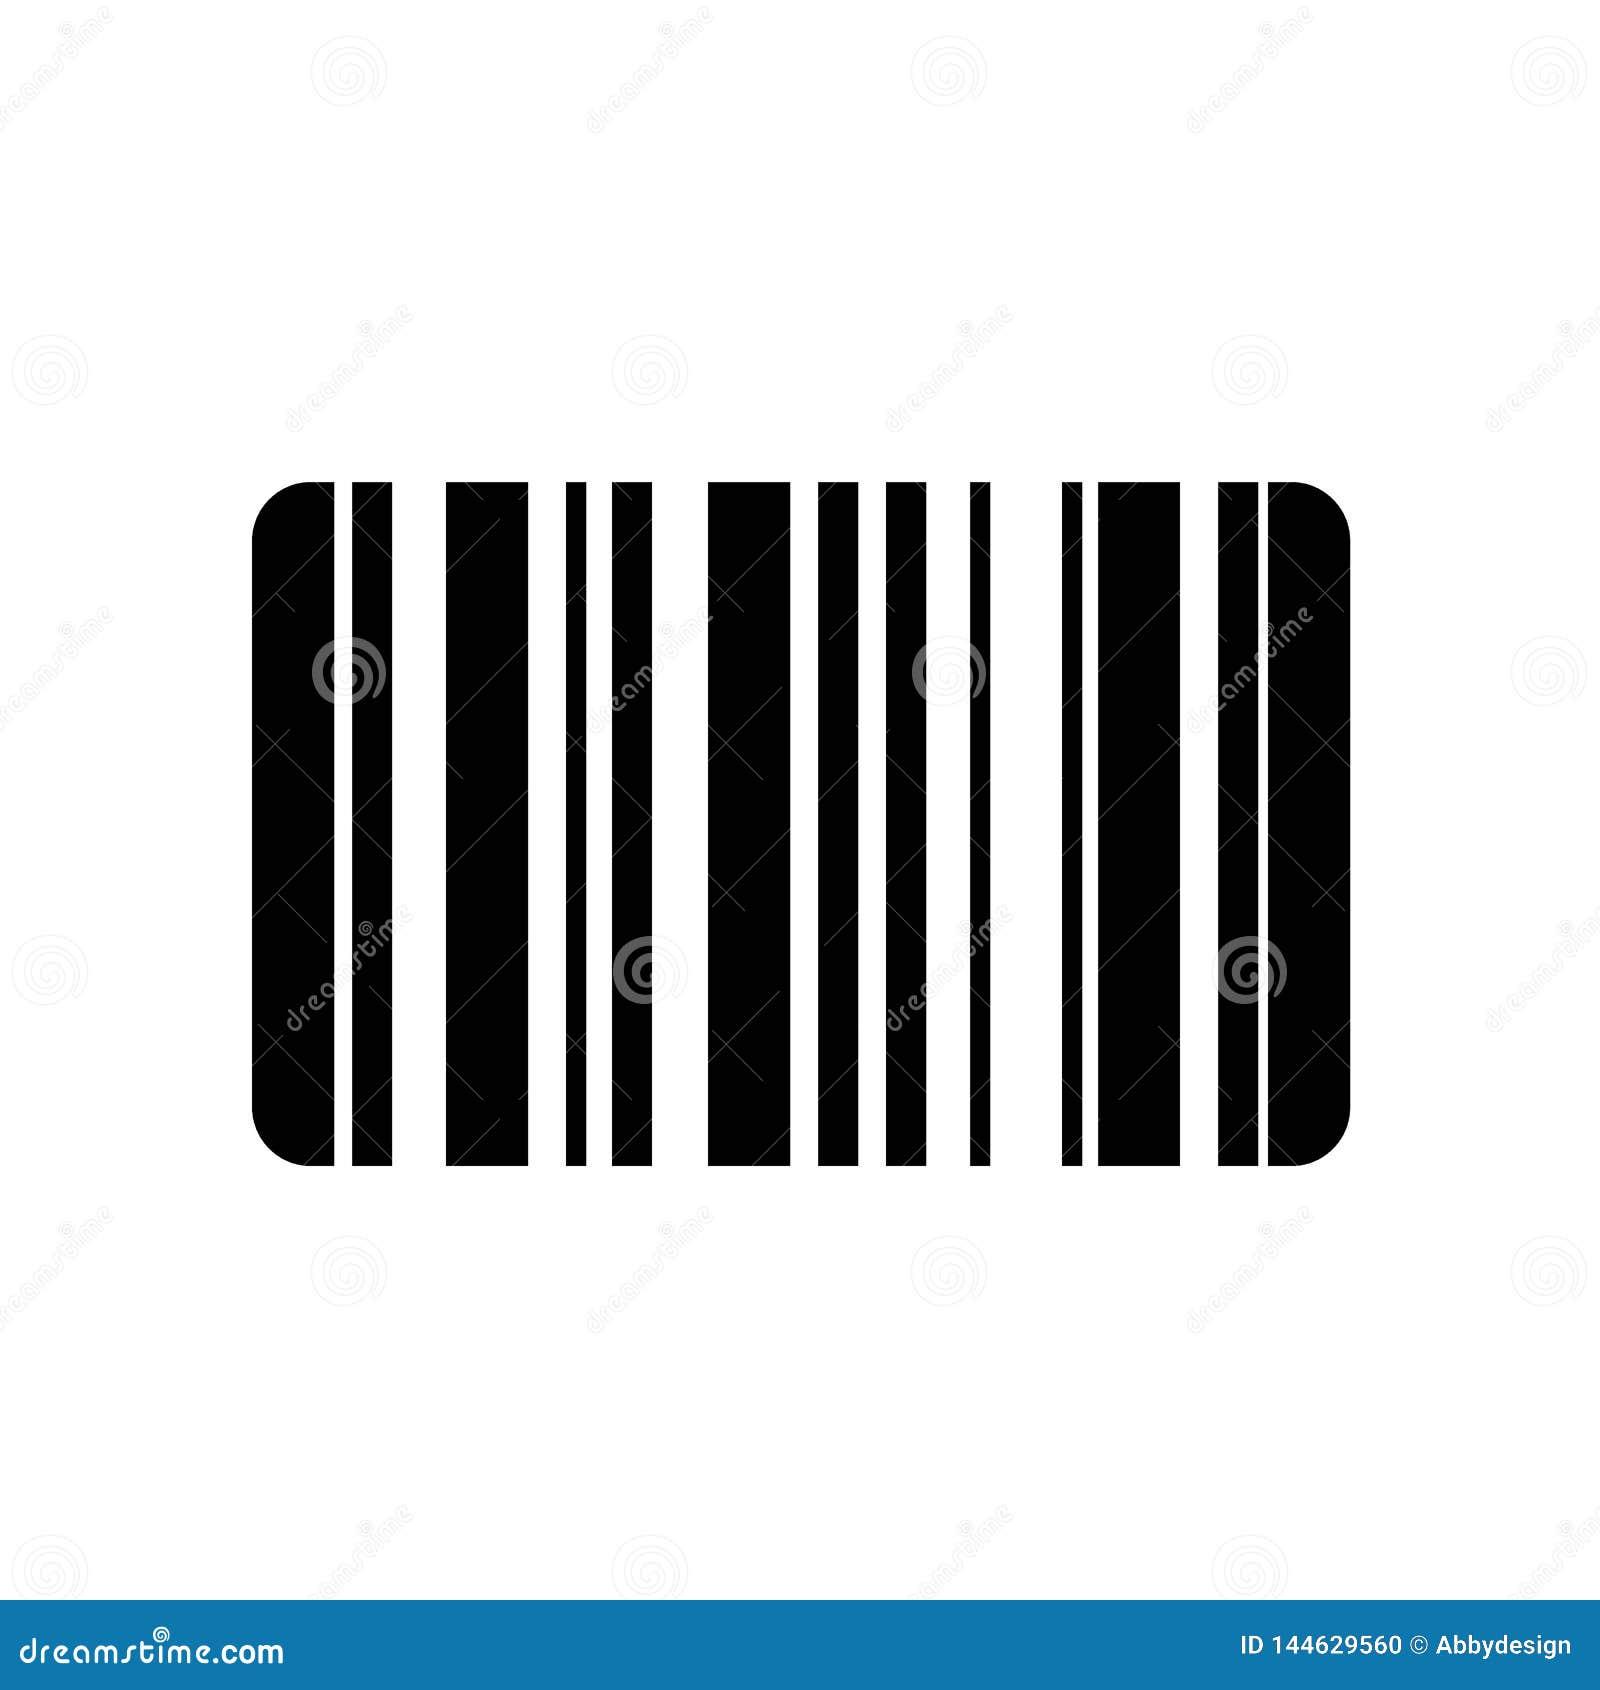 Barcodeikonenvektor